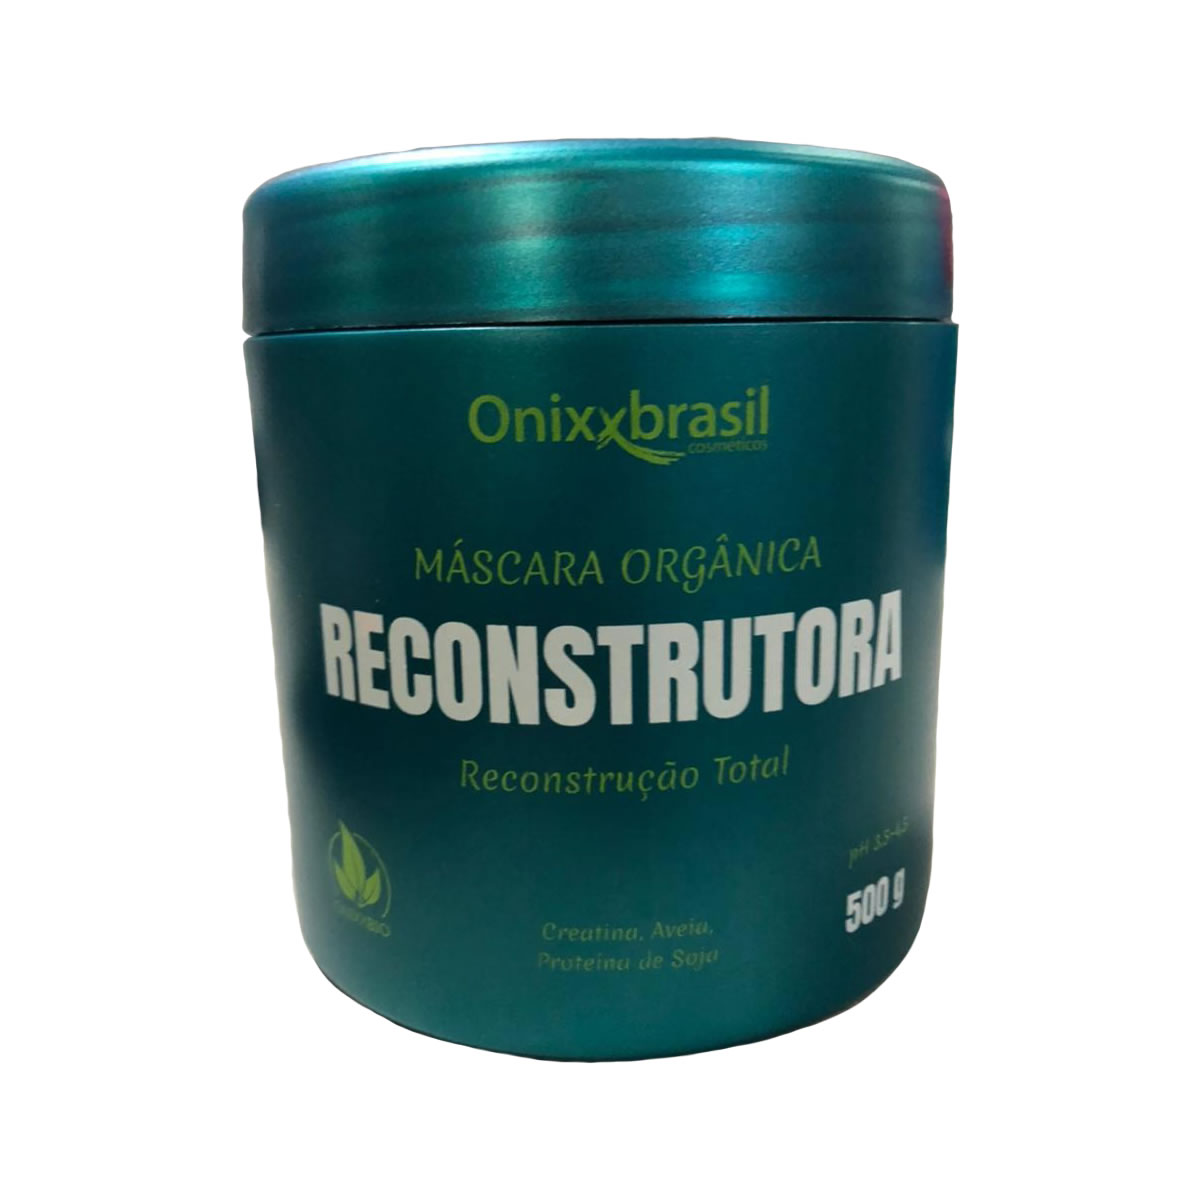 Máscara Orgânica Reconstrutora 500g - Onixxbrasil